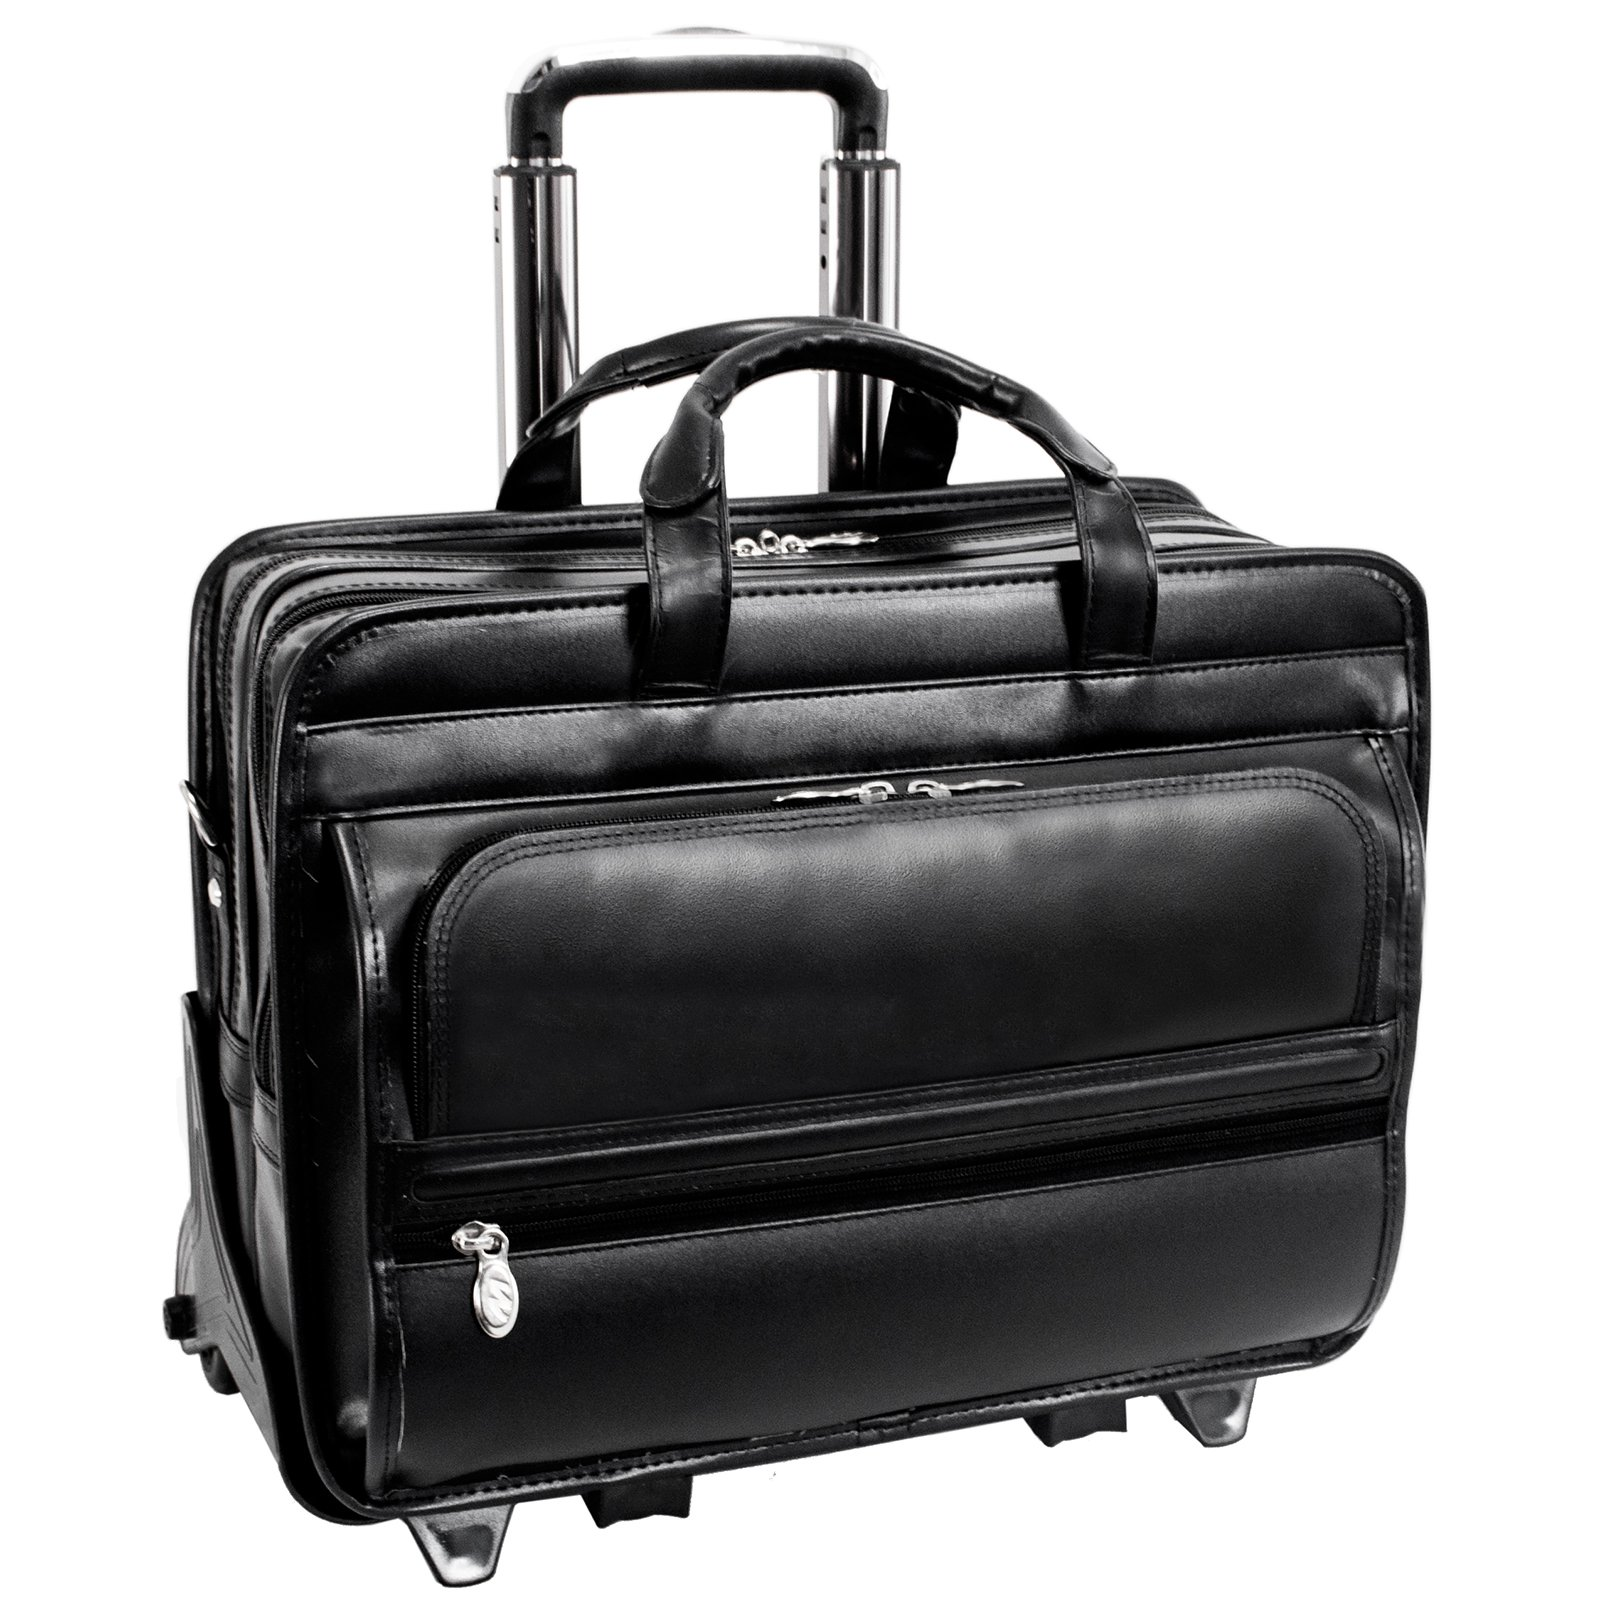 McKlein USA Franklin Leather 17 Inch Detachable Wheeled Laptop Case Black by McKleinUSA